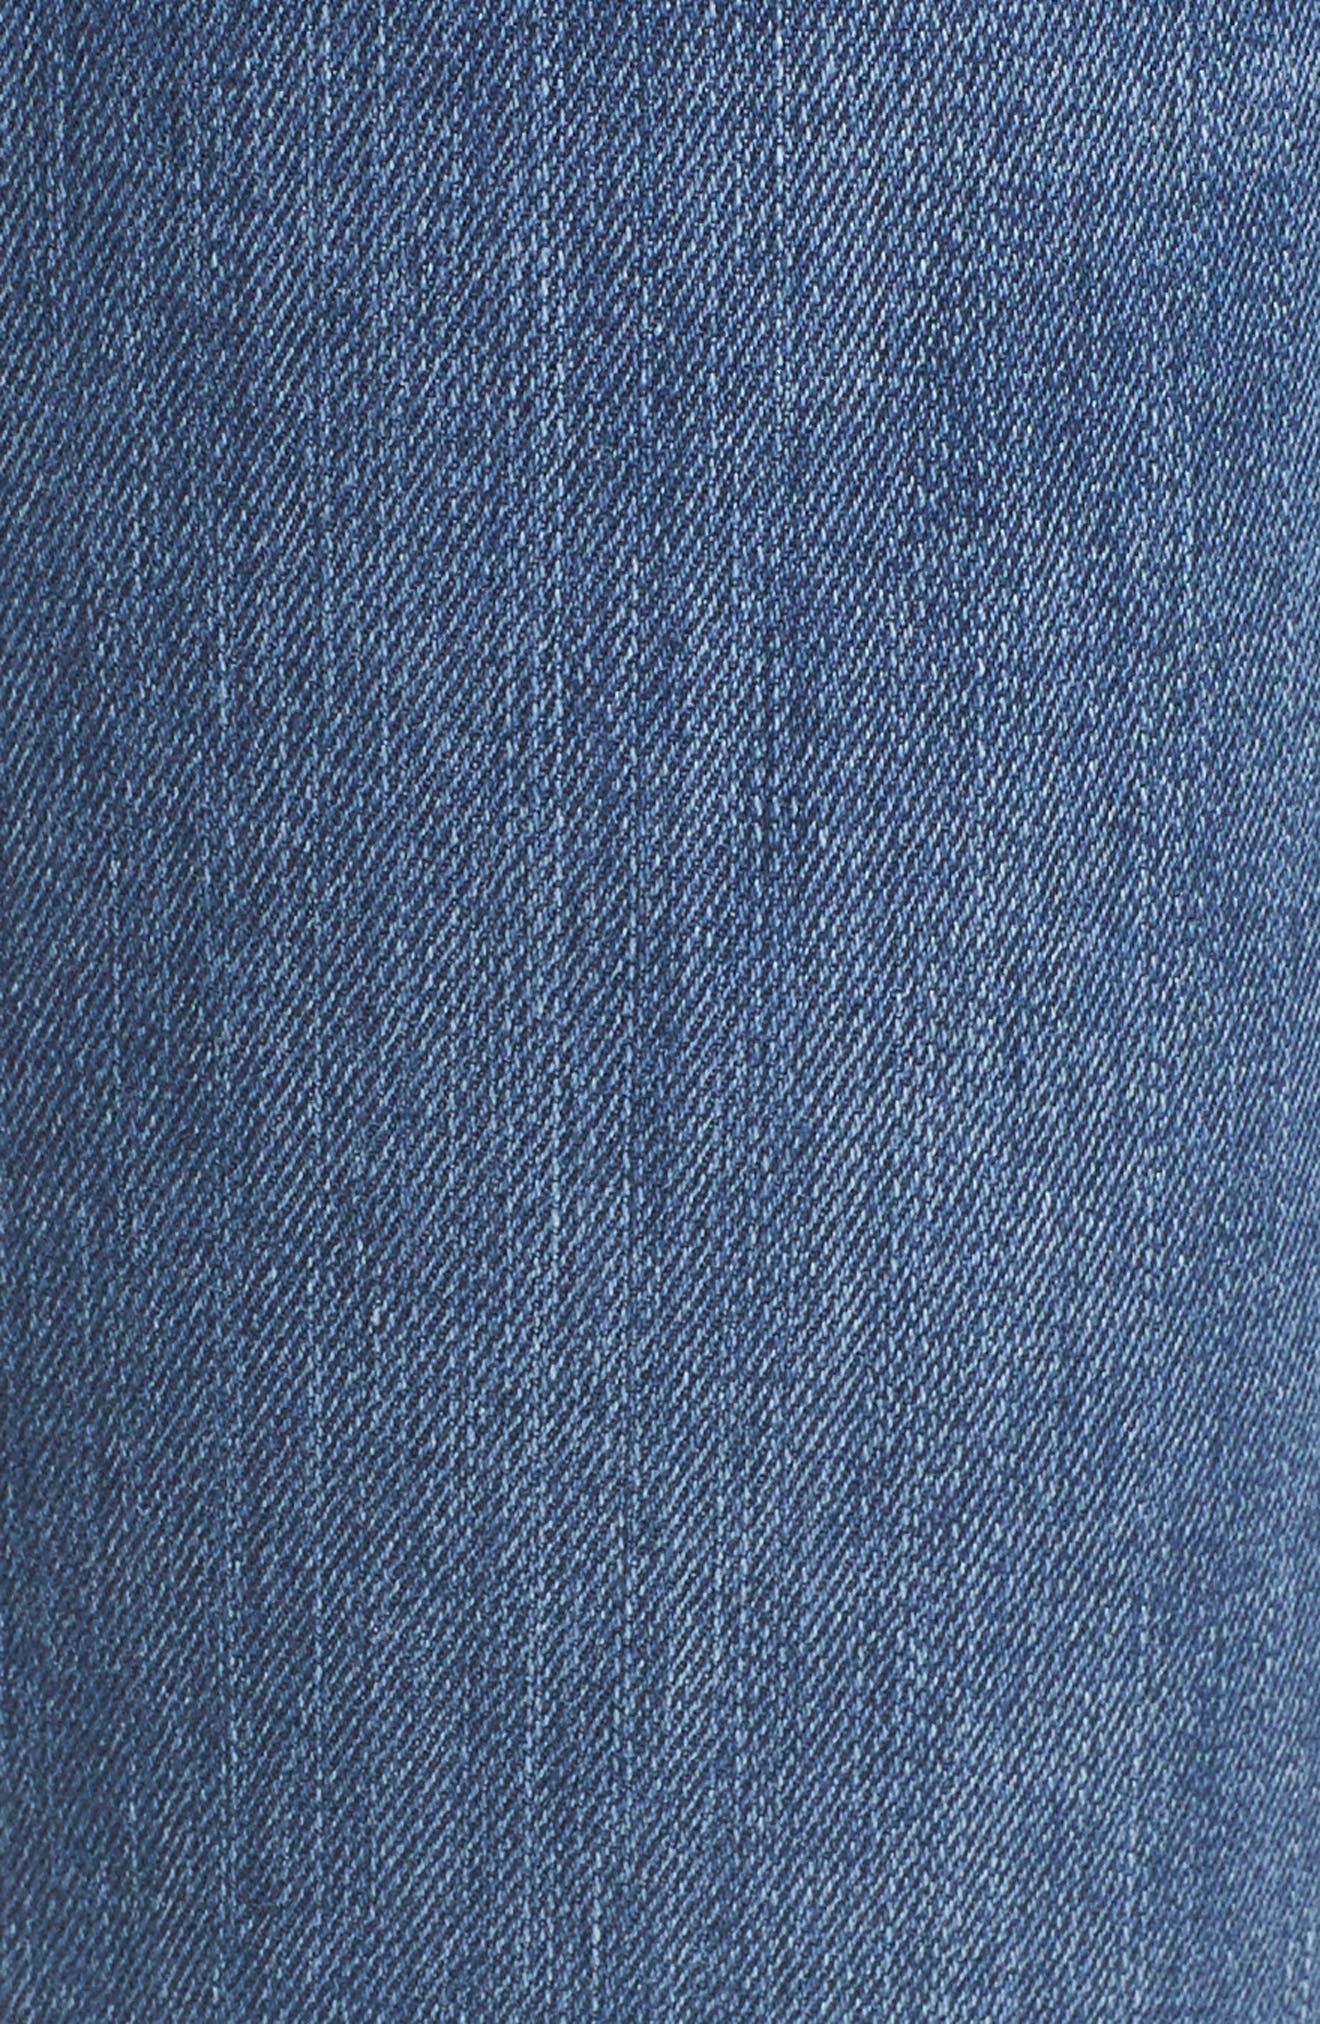 Mera Skinny Ankle Jeans,                             Alternate thumbnail 5, color,                             420